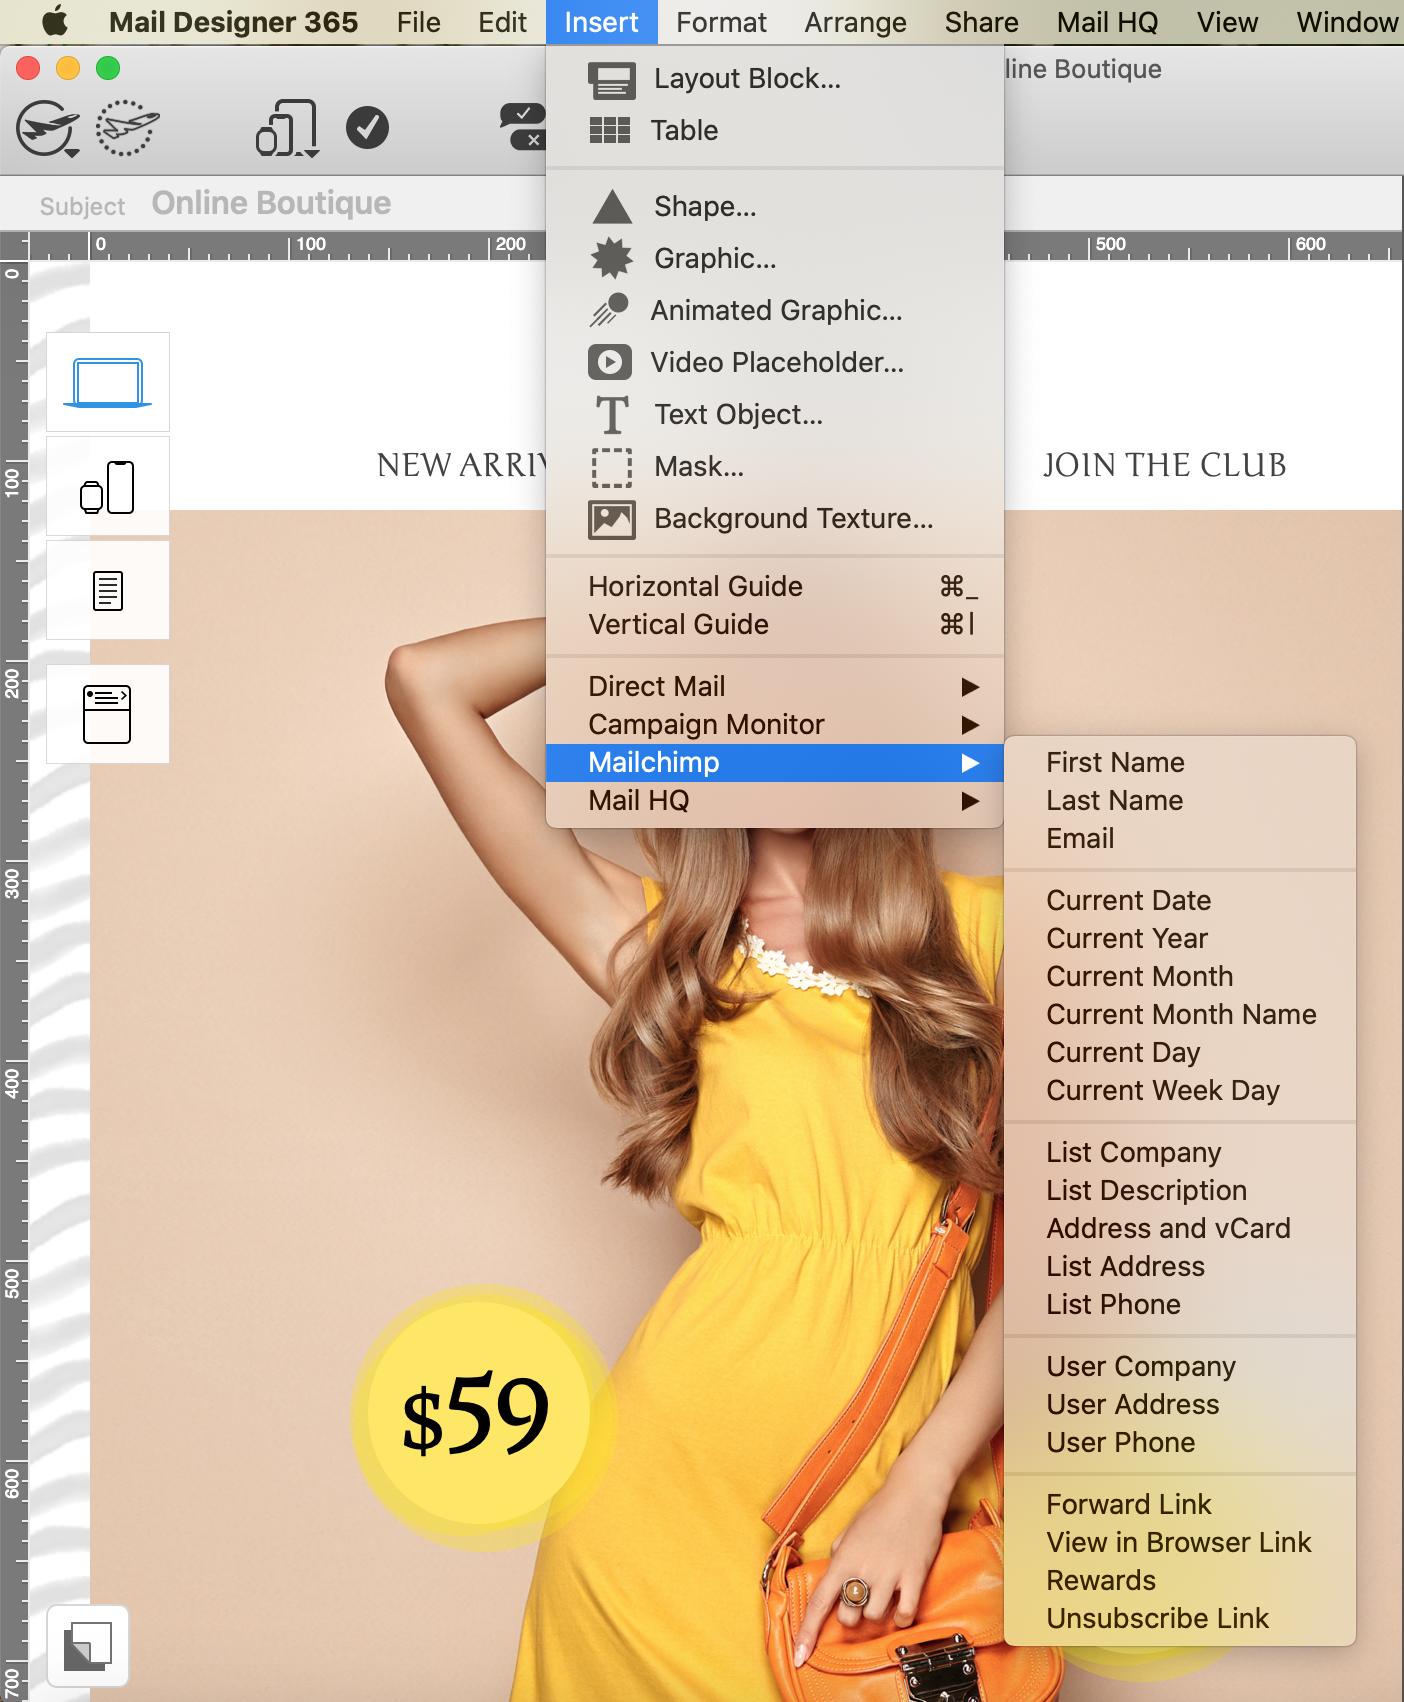 Adding a Mailchimp placeholder in Mail Designer 365